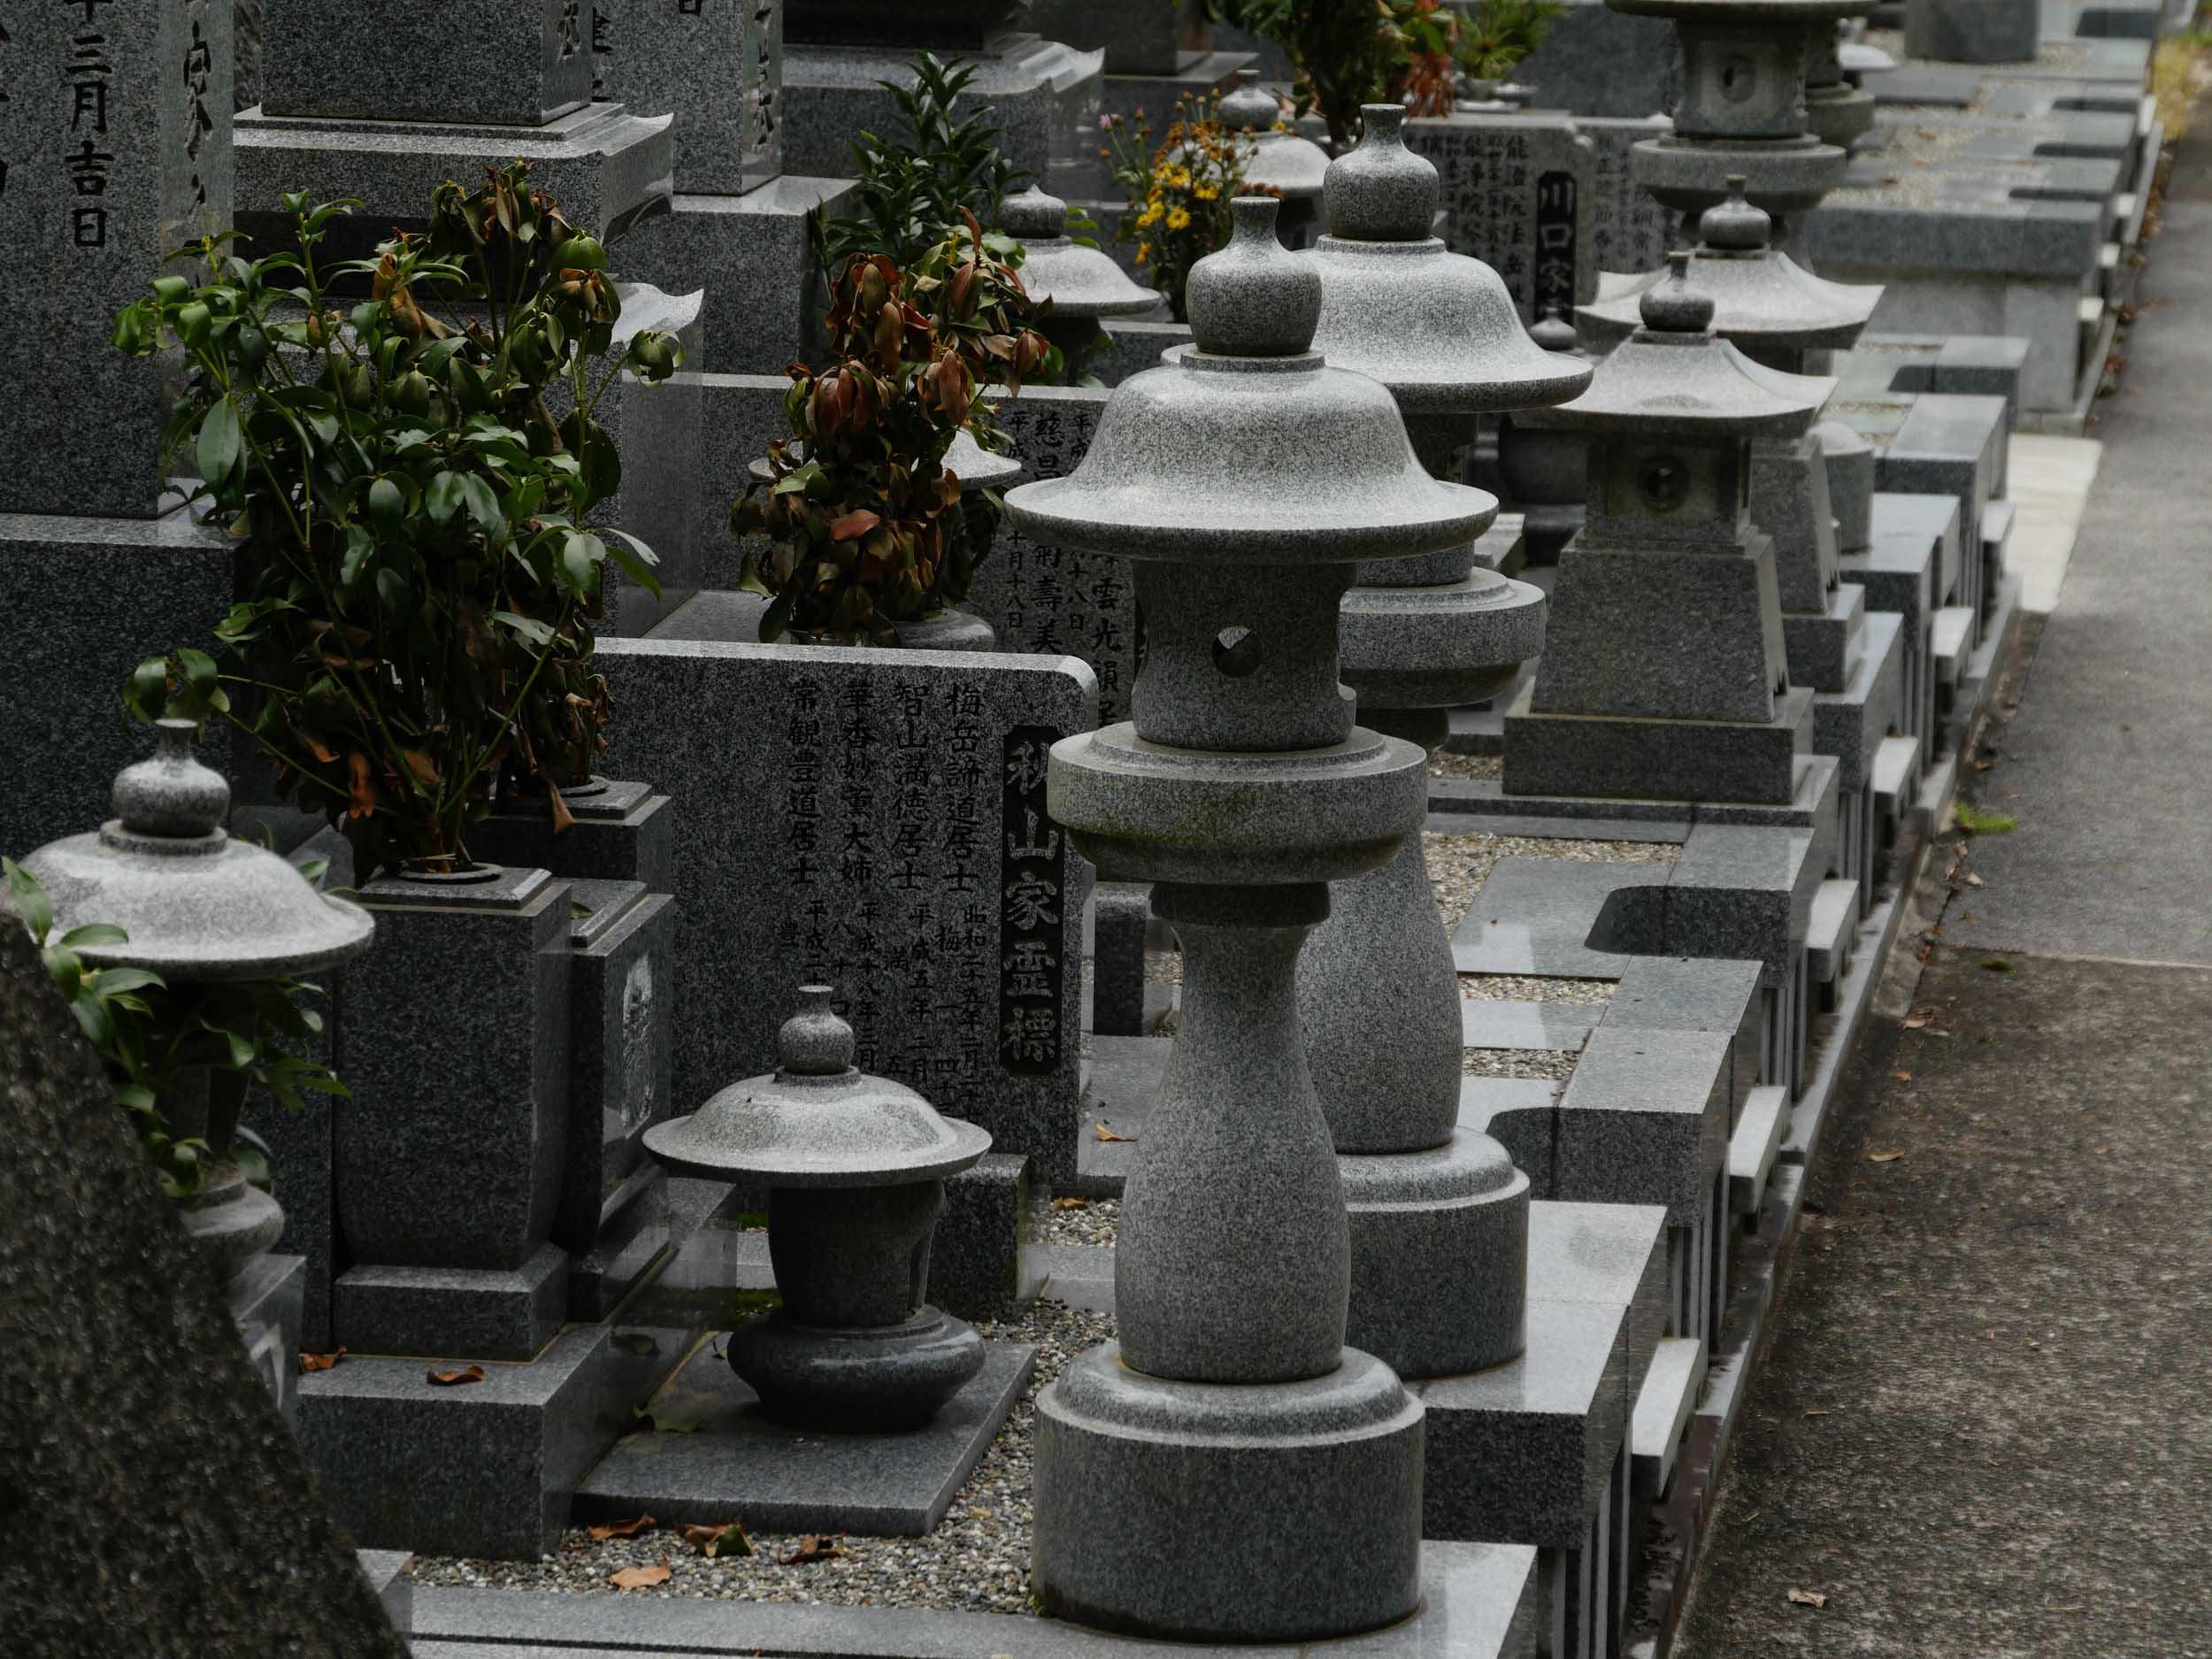 matsuyama-dougo-onsen-43.jpg